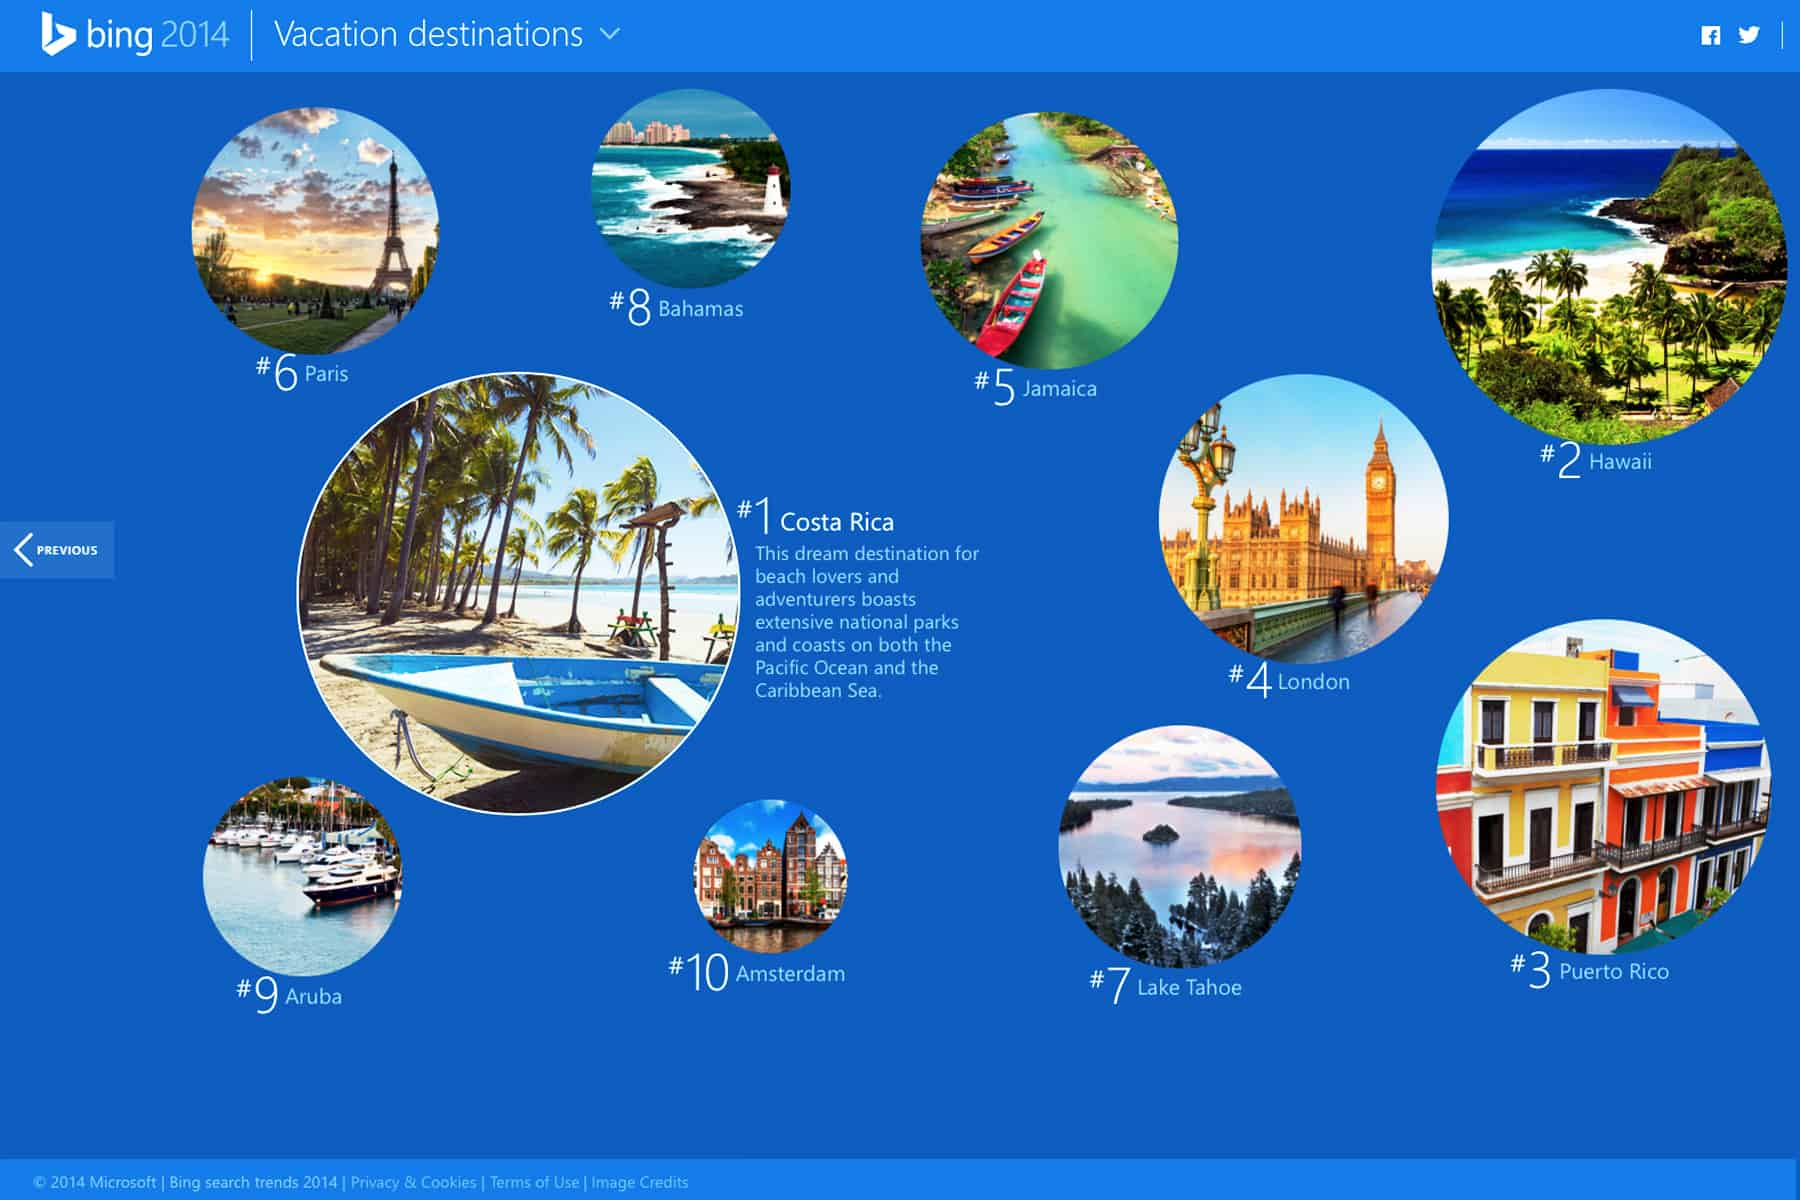 Bing Most Popular Vacation Destinations 2014